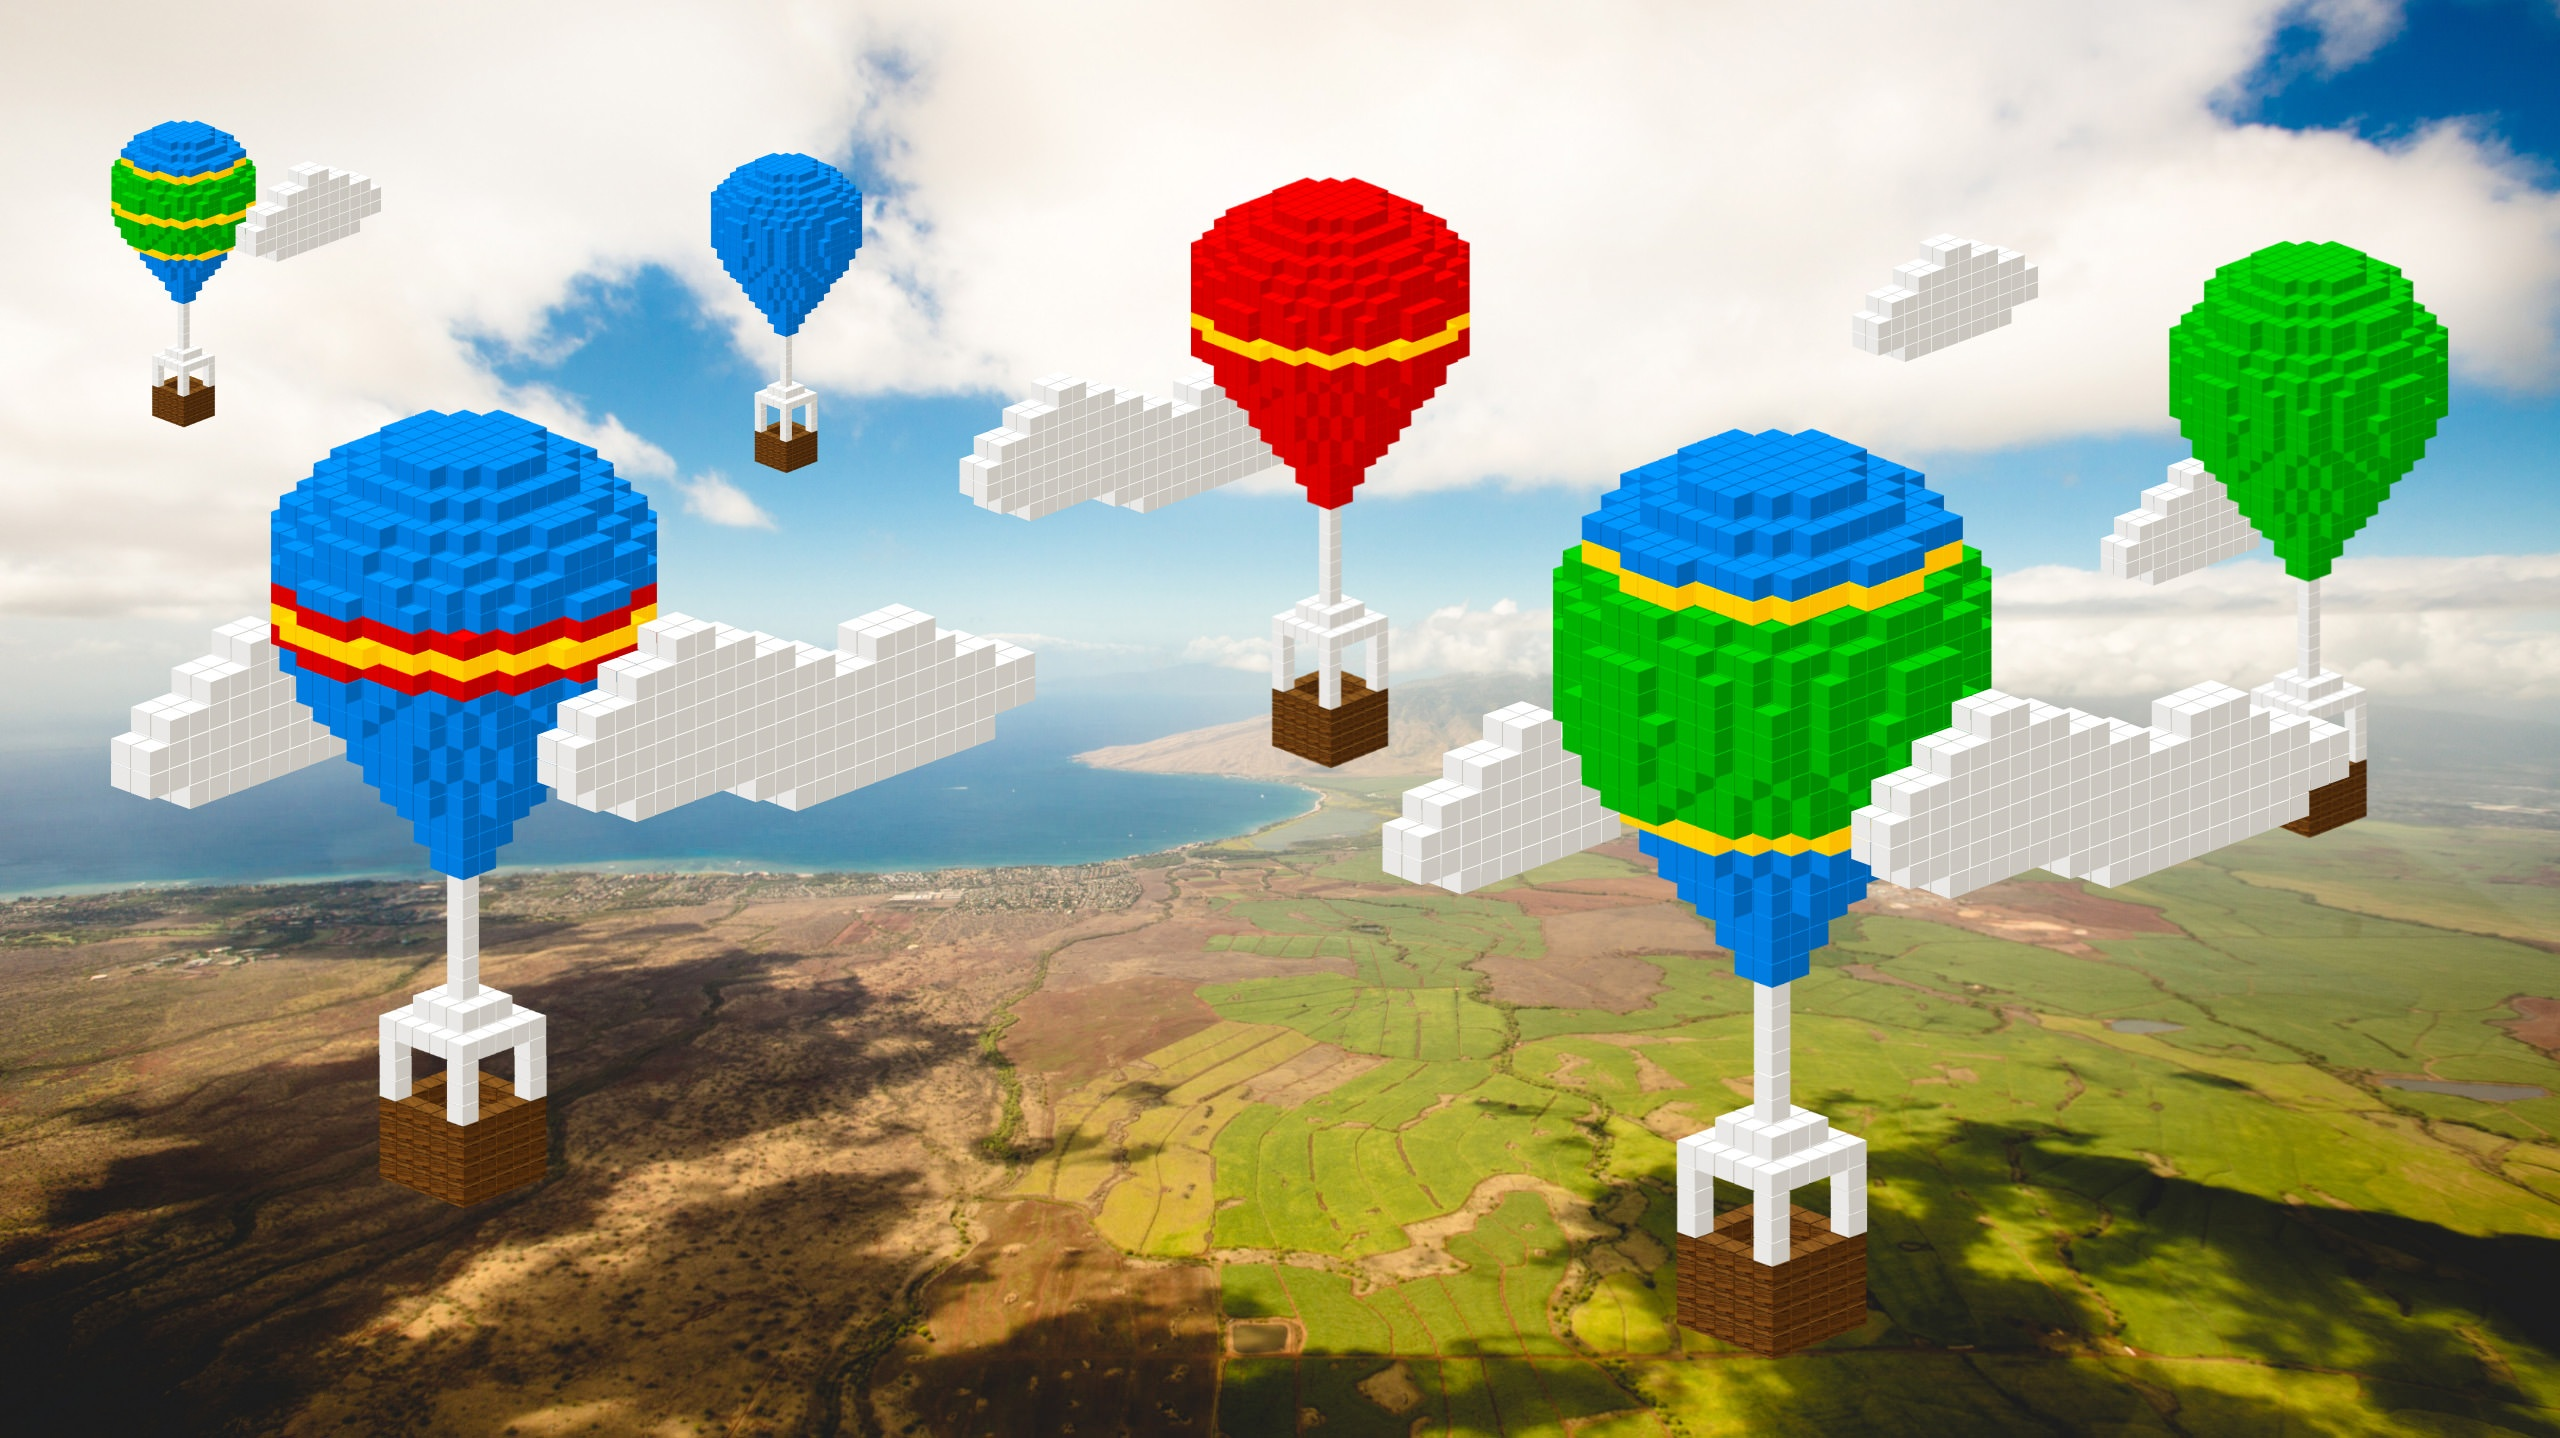 ar_hot_air_balloons_large@2x-ad6bd37a